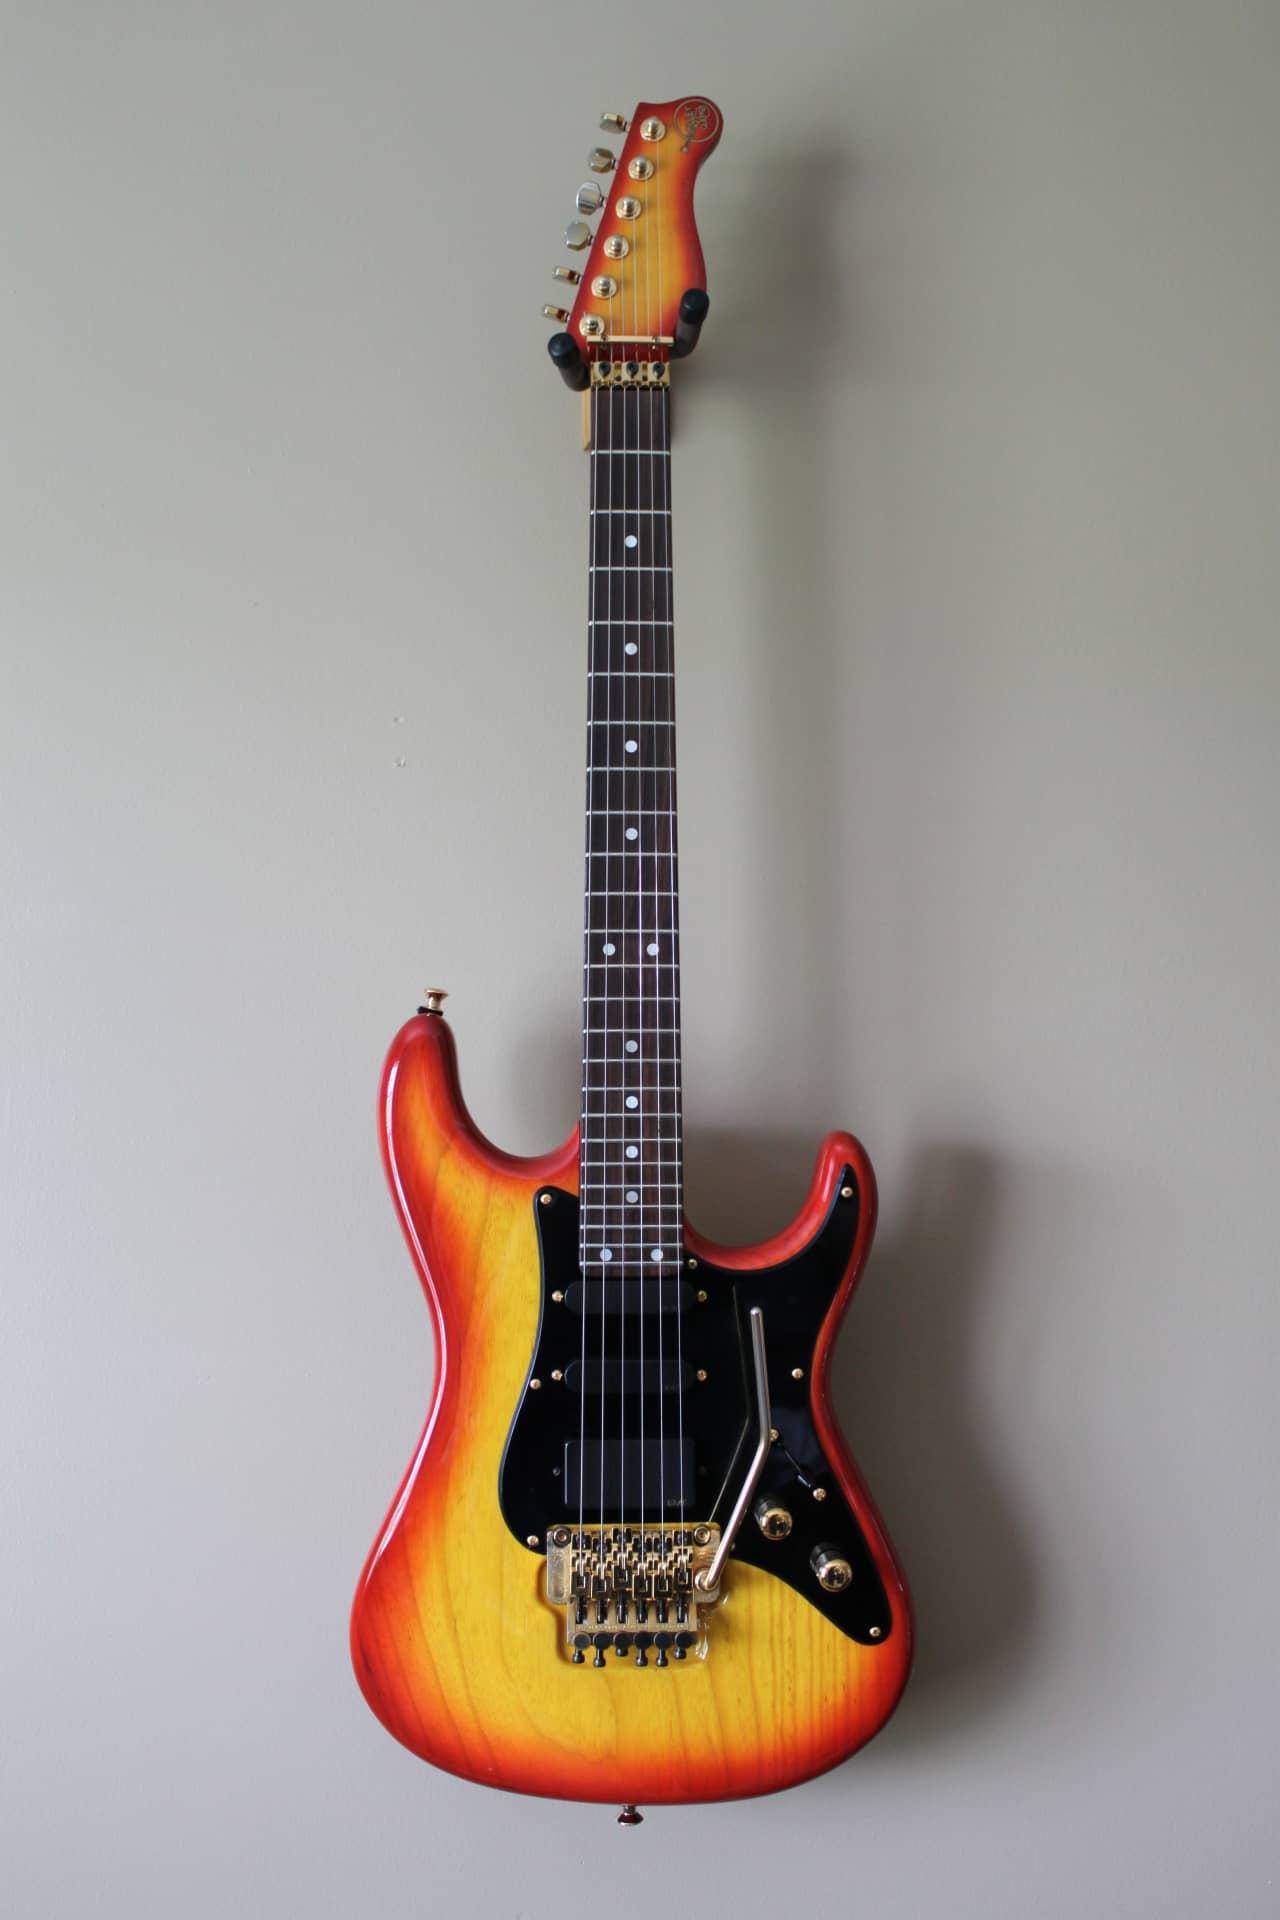 valley arts guitar custom pro 7 8s luke signature model 1990 reverb. Black Bedroom Furniture Sets. Home Design Ideas